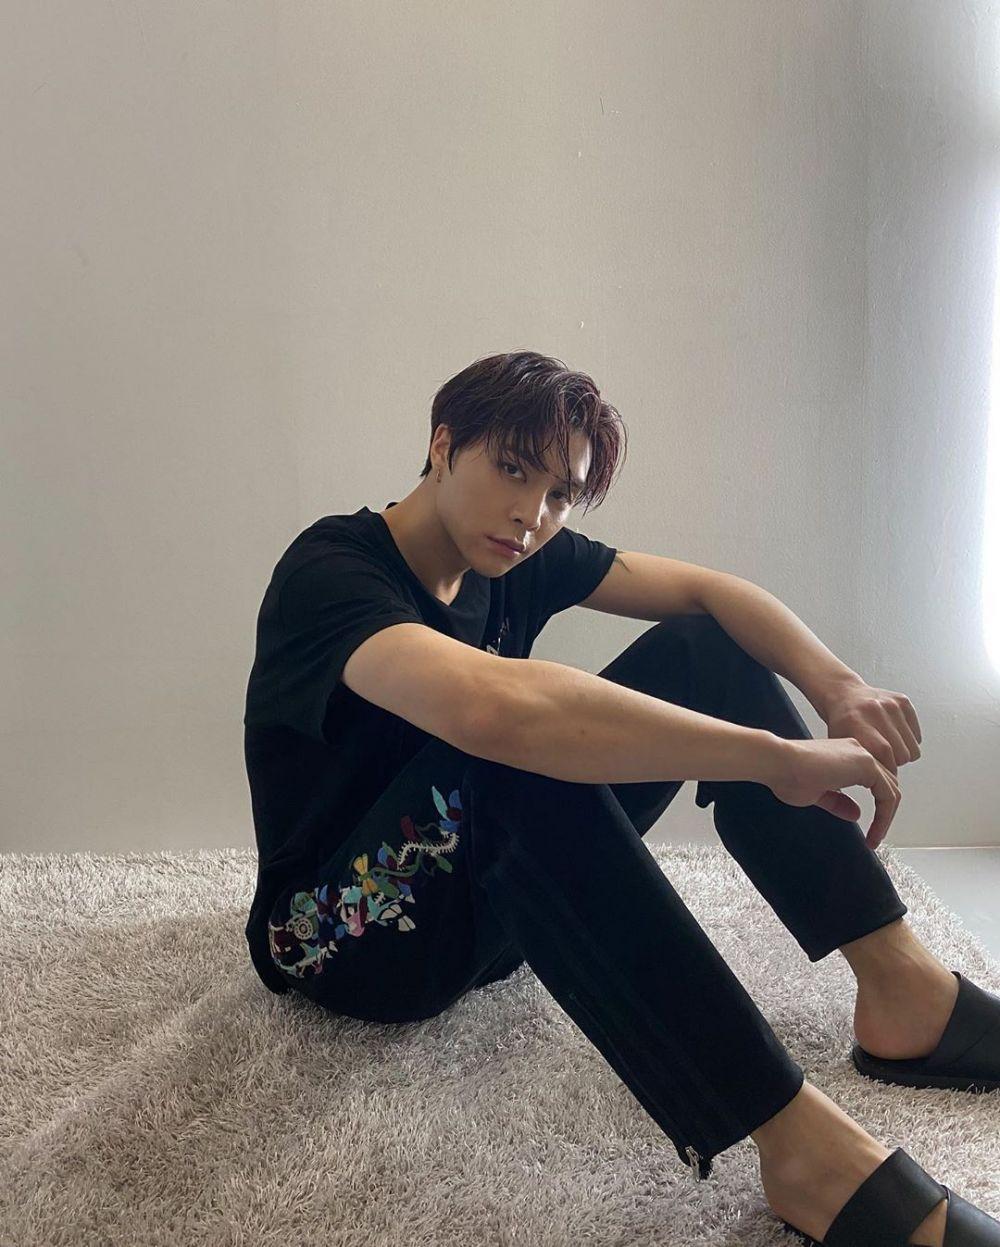 NCT Segera Rilis Album, 9 Ide Gaya Kasual hingga Formal ala Johnny